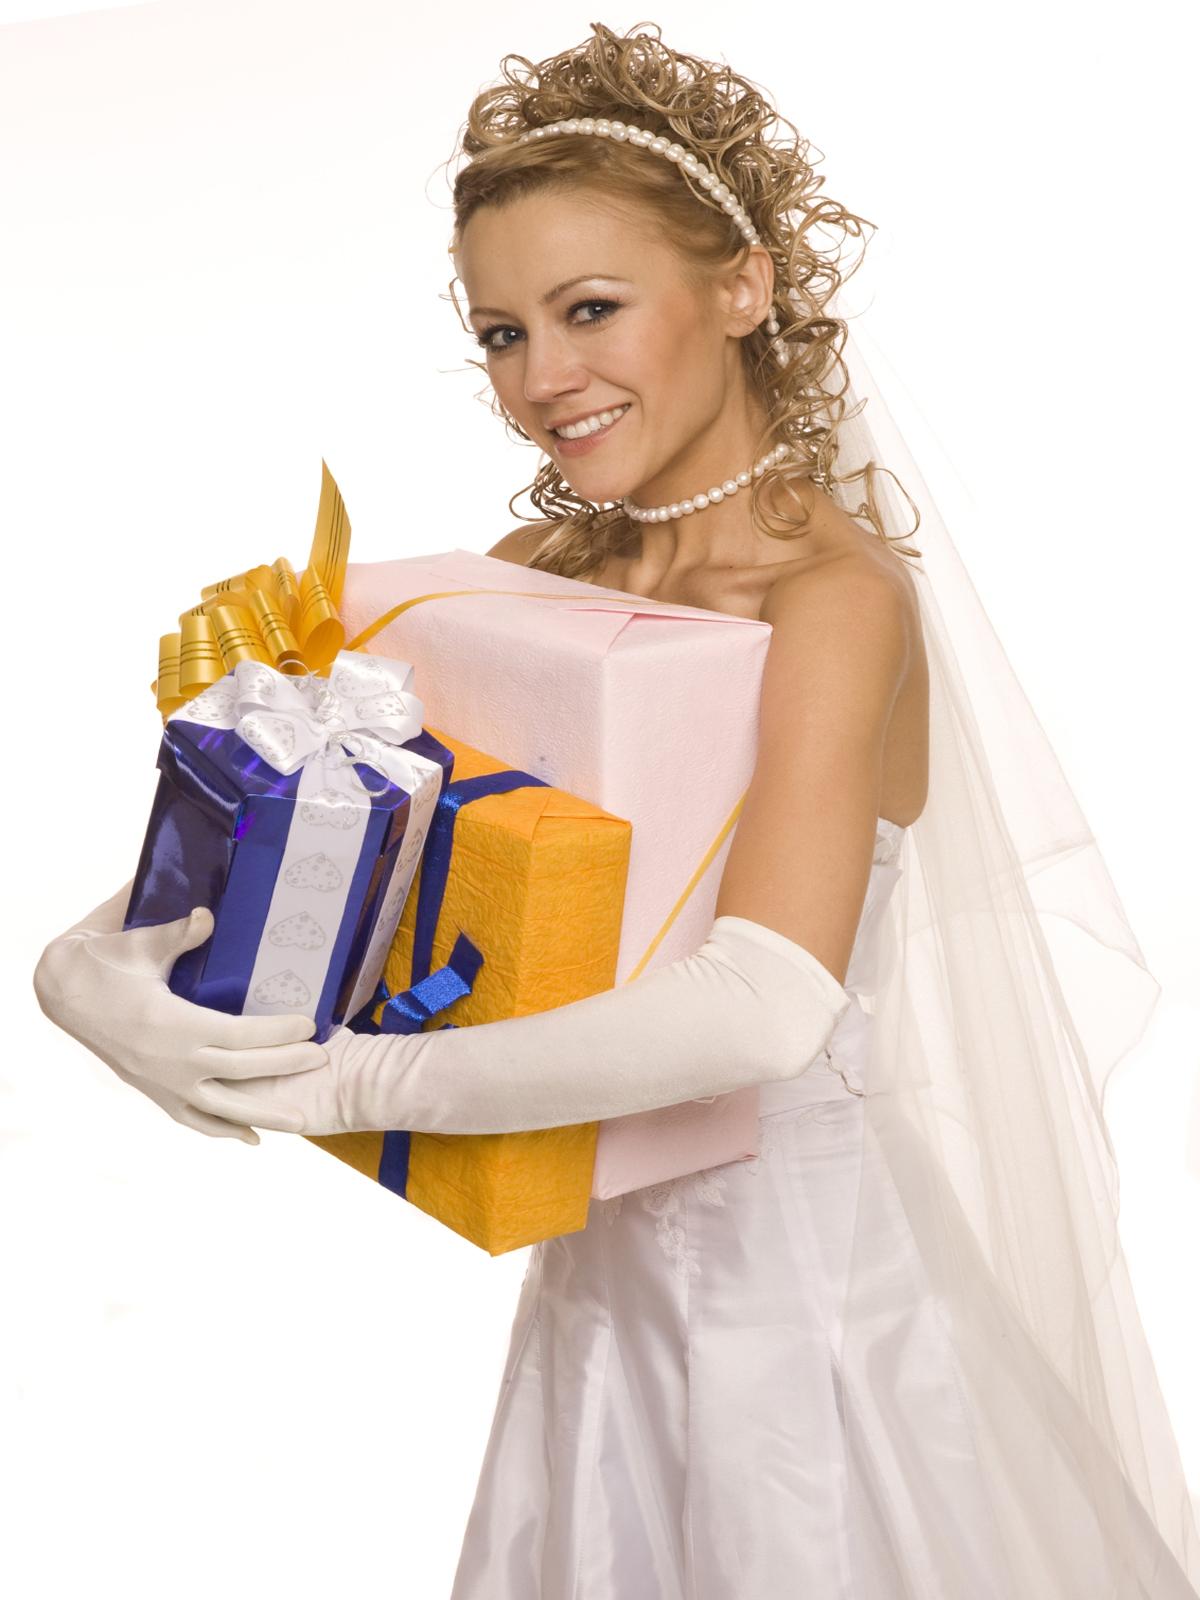 Кто кому дарить на свадьбе подарки 844